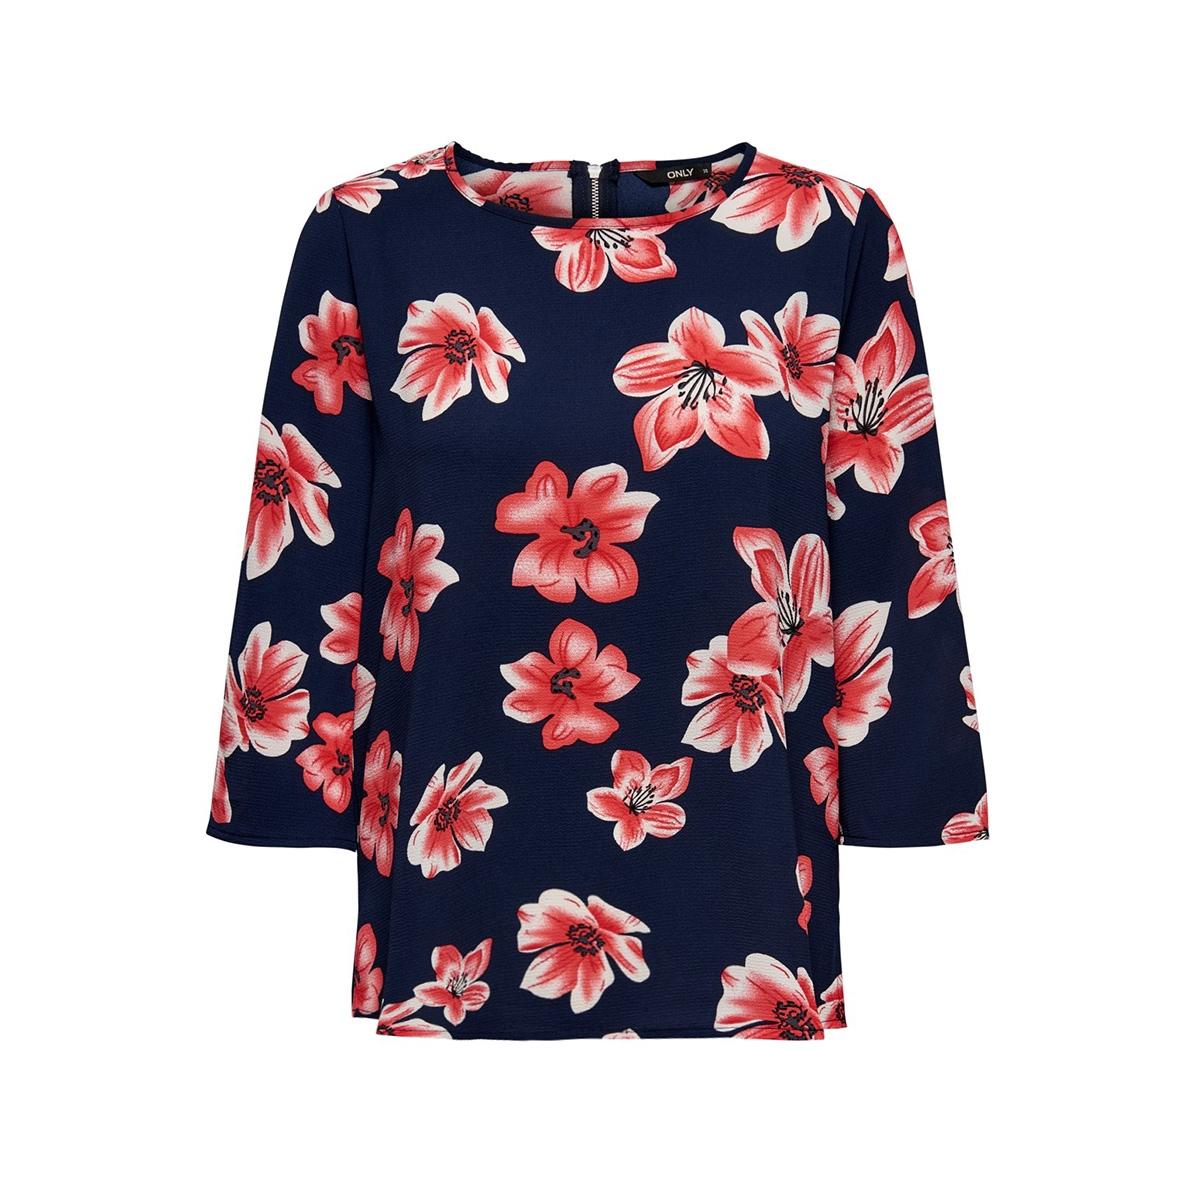 onlnova 3 4 sleeve top aop  lux  wv 15177700 only blouse night sky/berlin flower